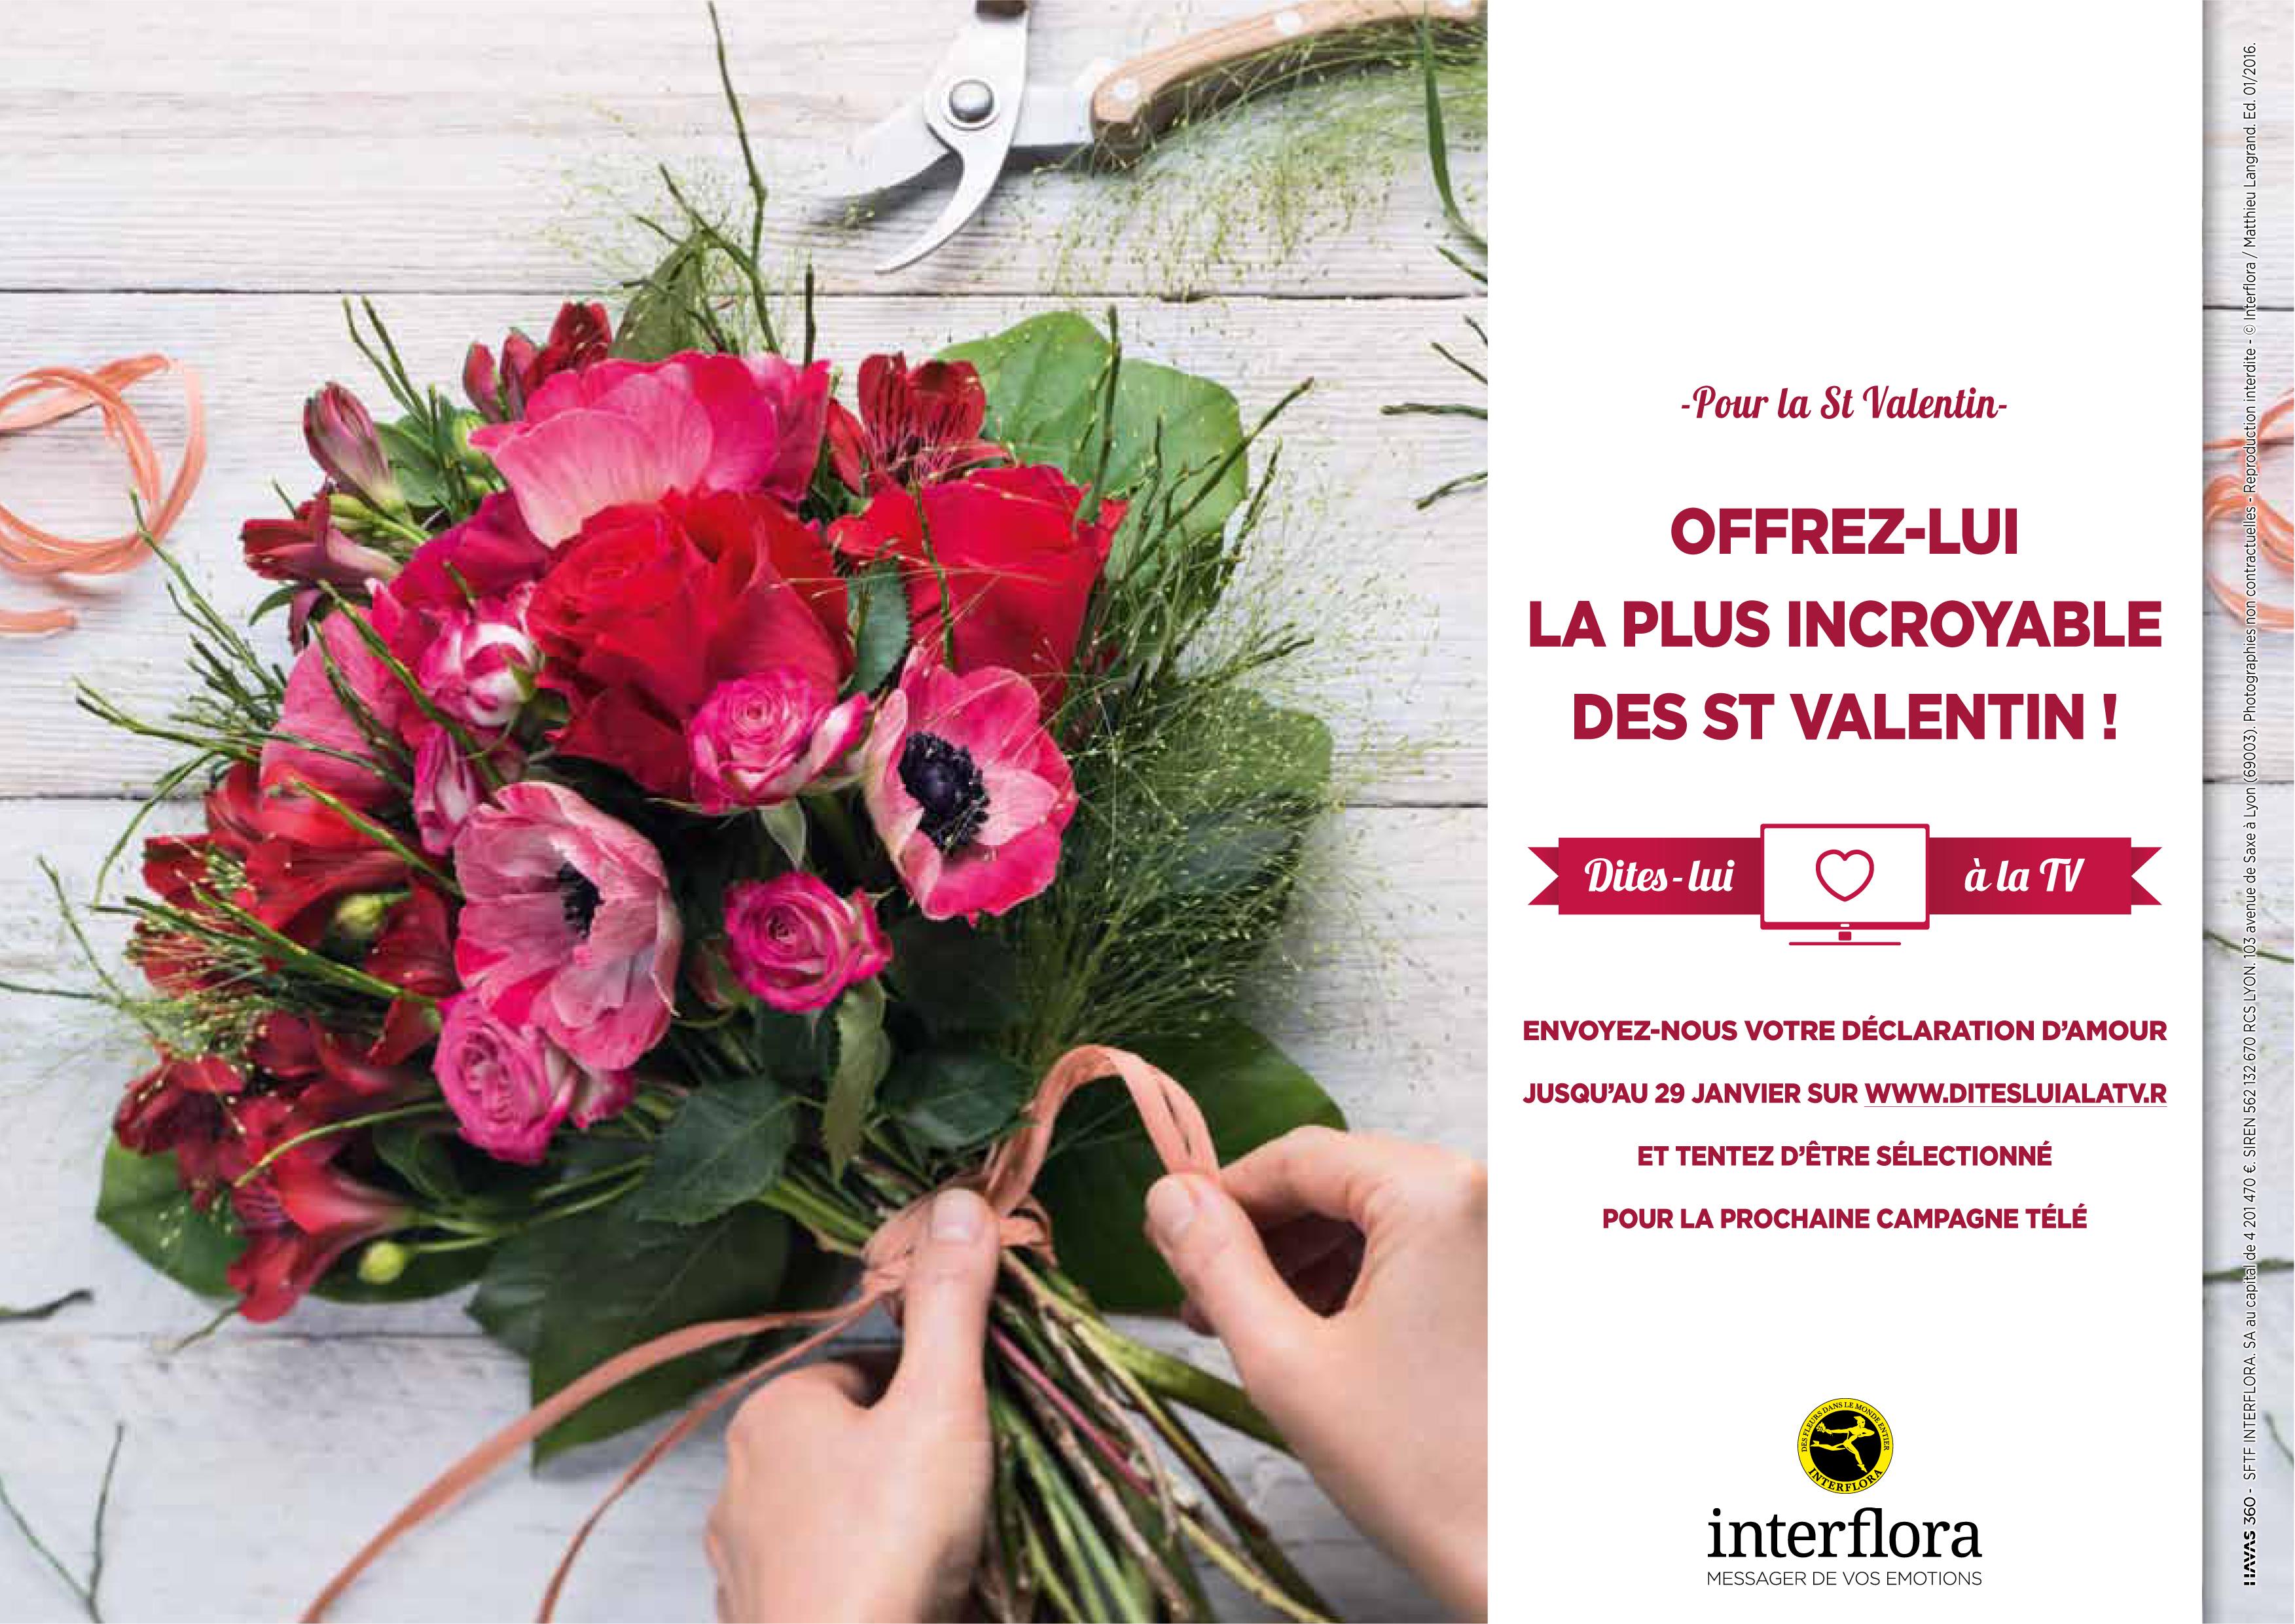 Pour La Saint Valentin Interflora Invite Les Internautes Dans Sa